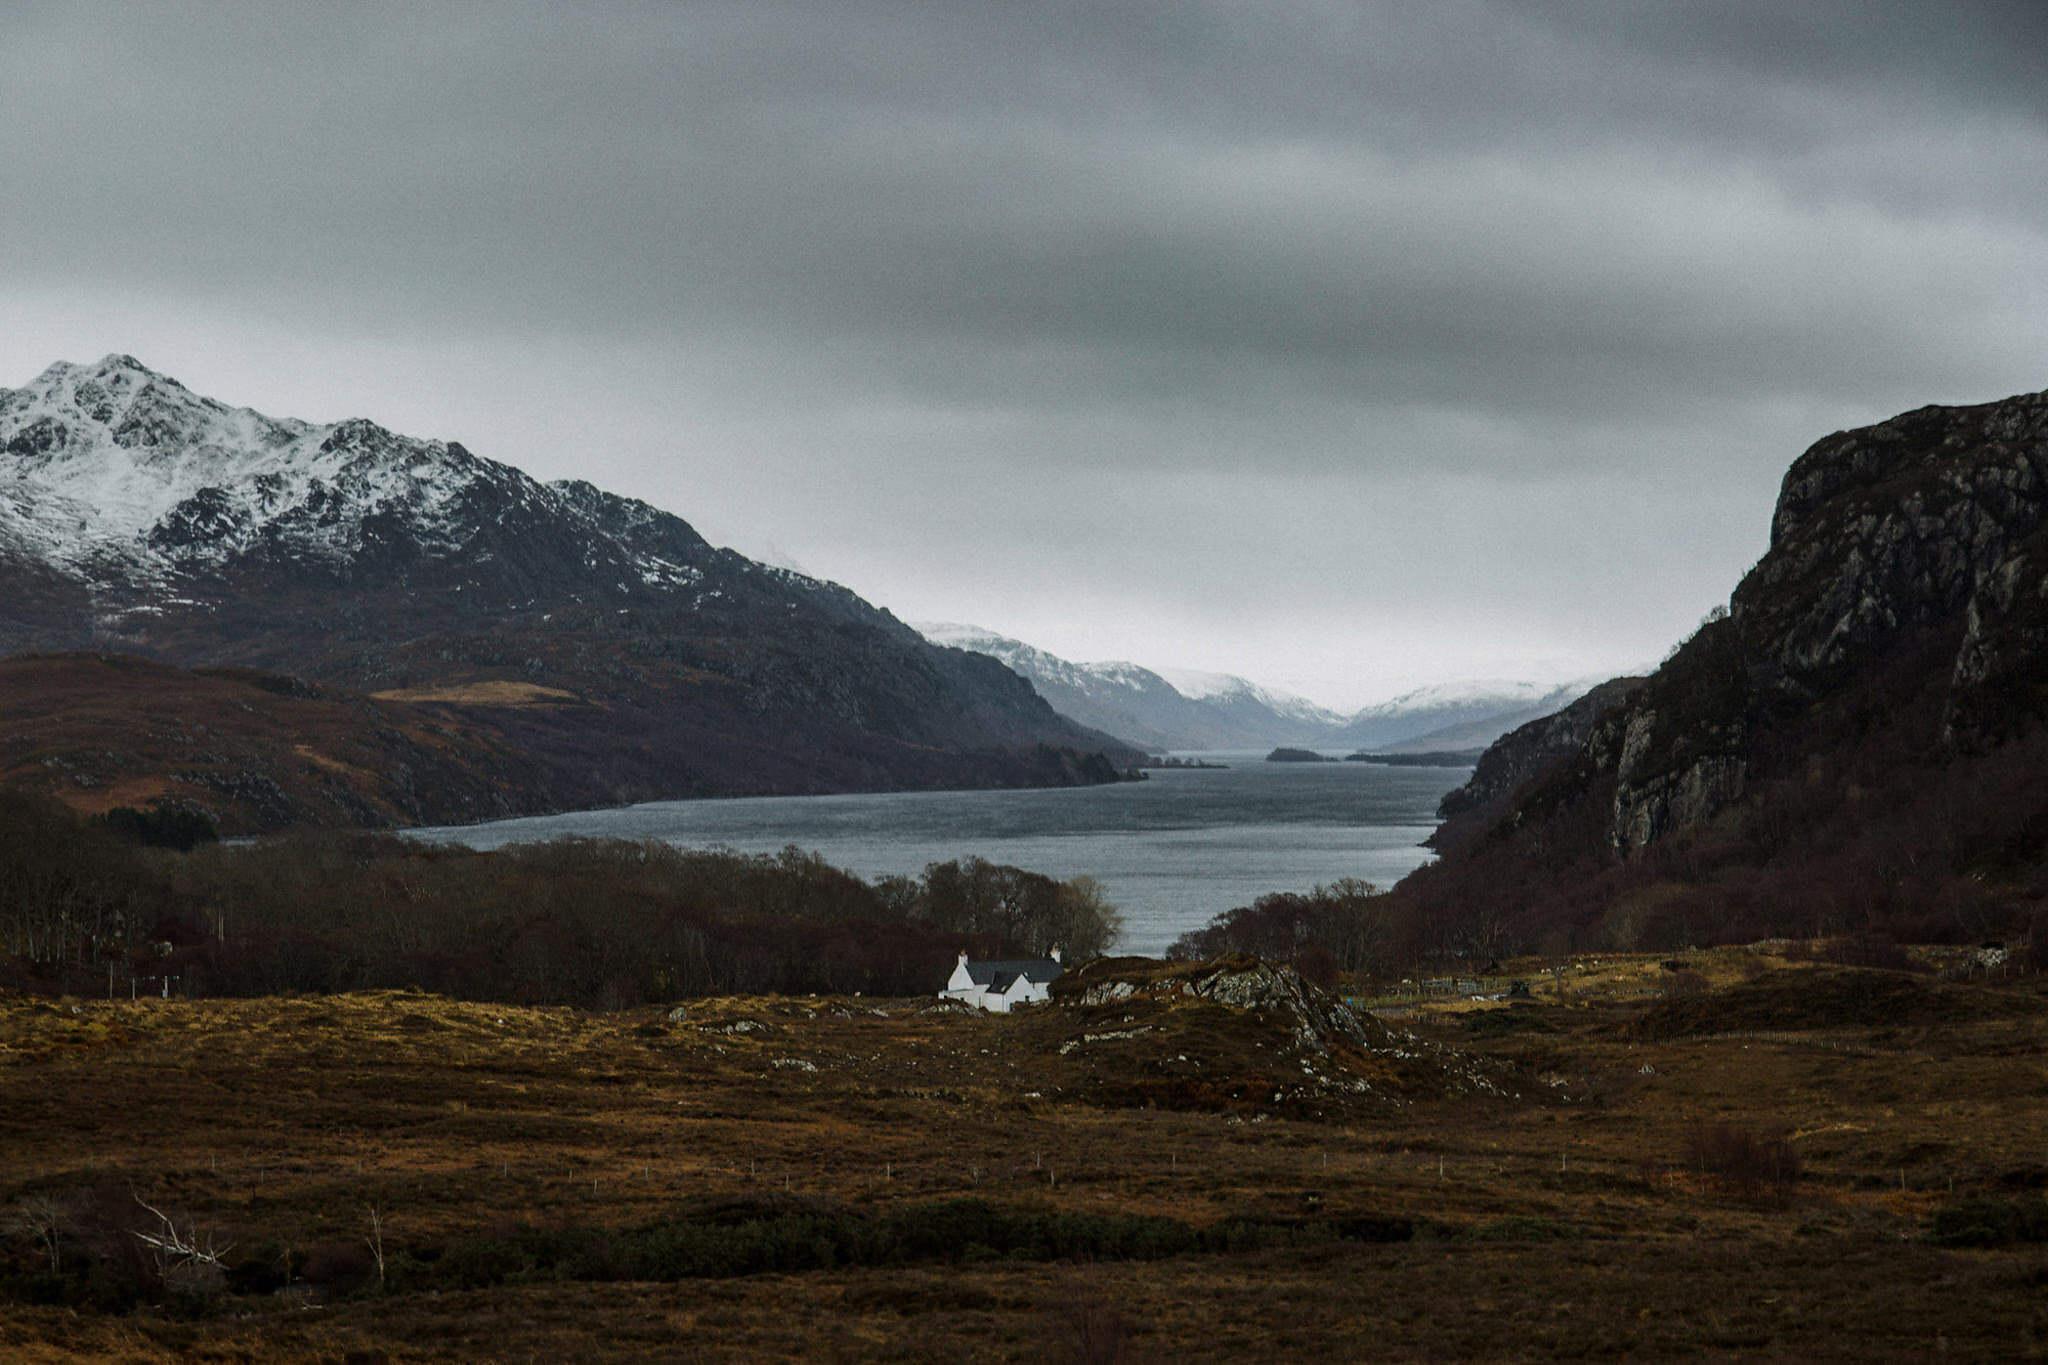 Elope in Scotland Scottish landscape Loch Maree and cottage in winter